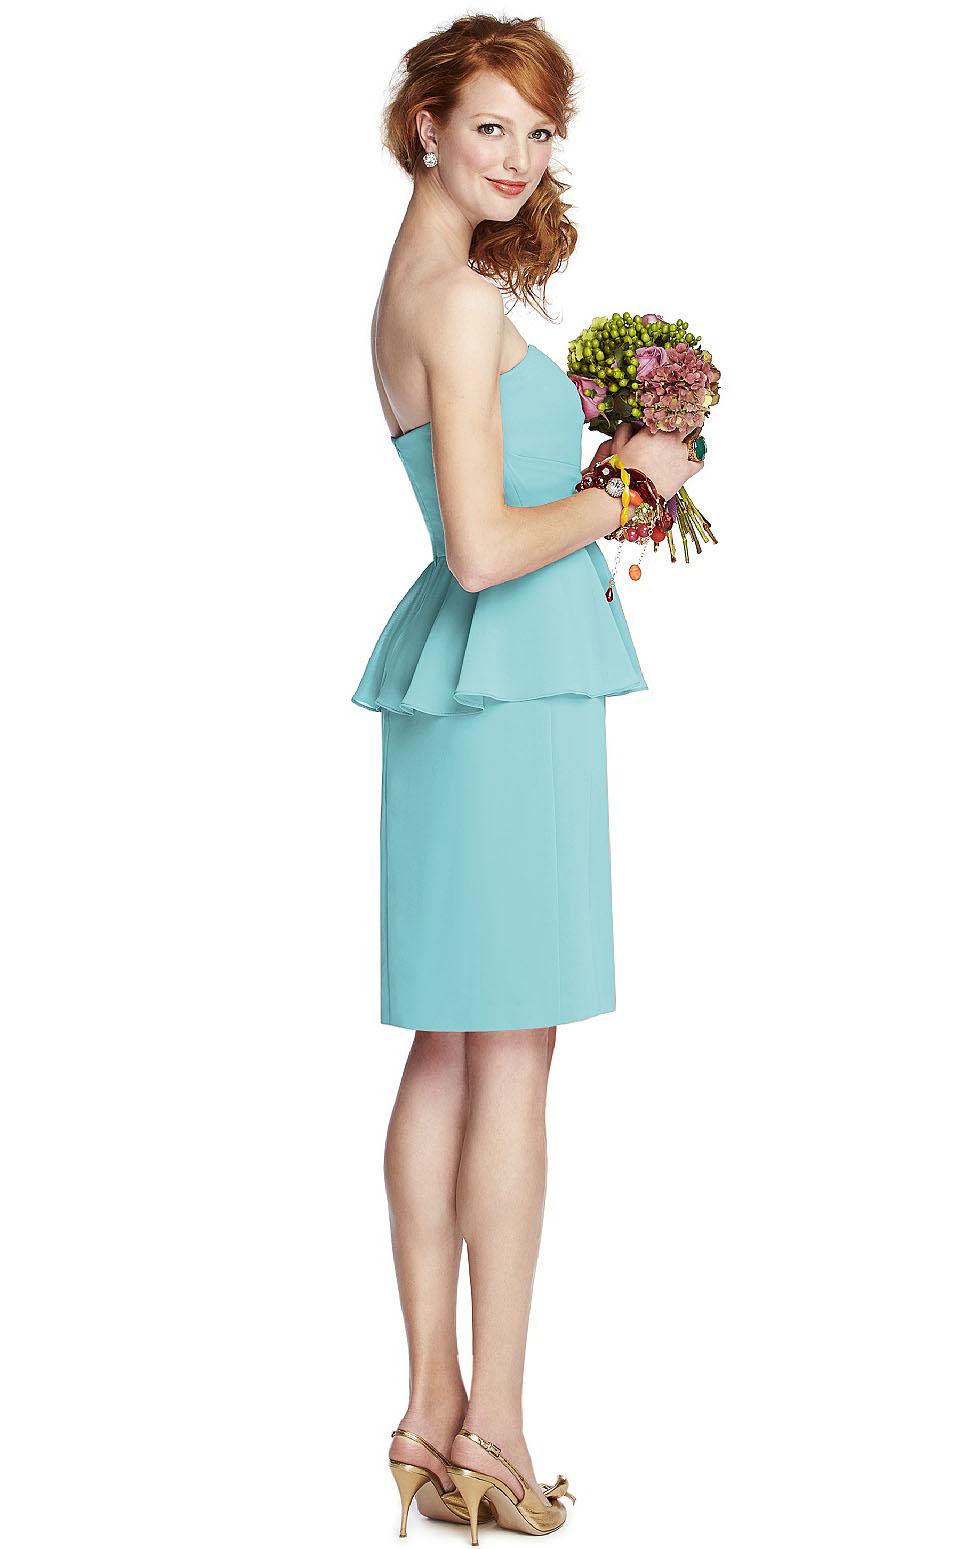 http://www.aislestyle.co.uk/chiffon-aline-natural-sleeveless-short-bridesmaid-dresses-p-4390.html